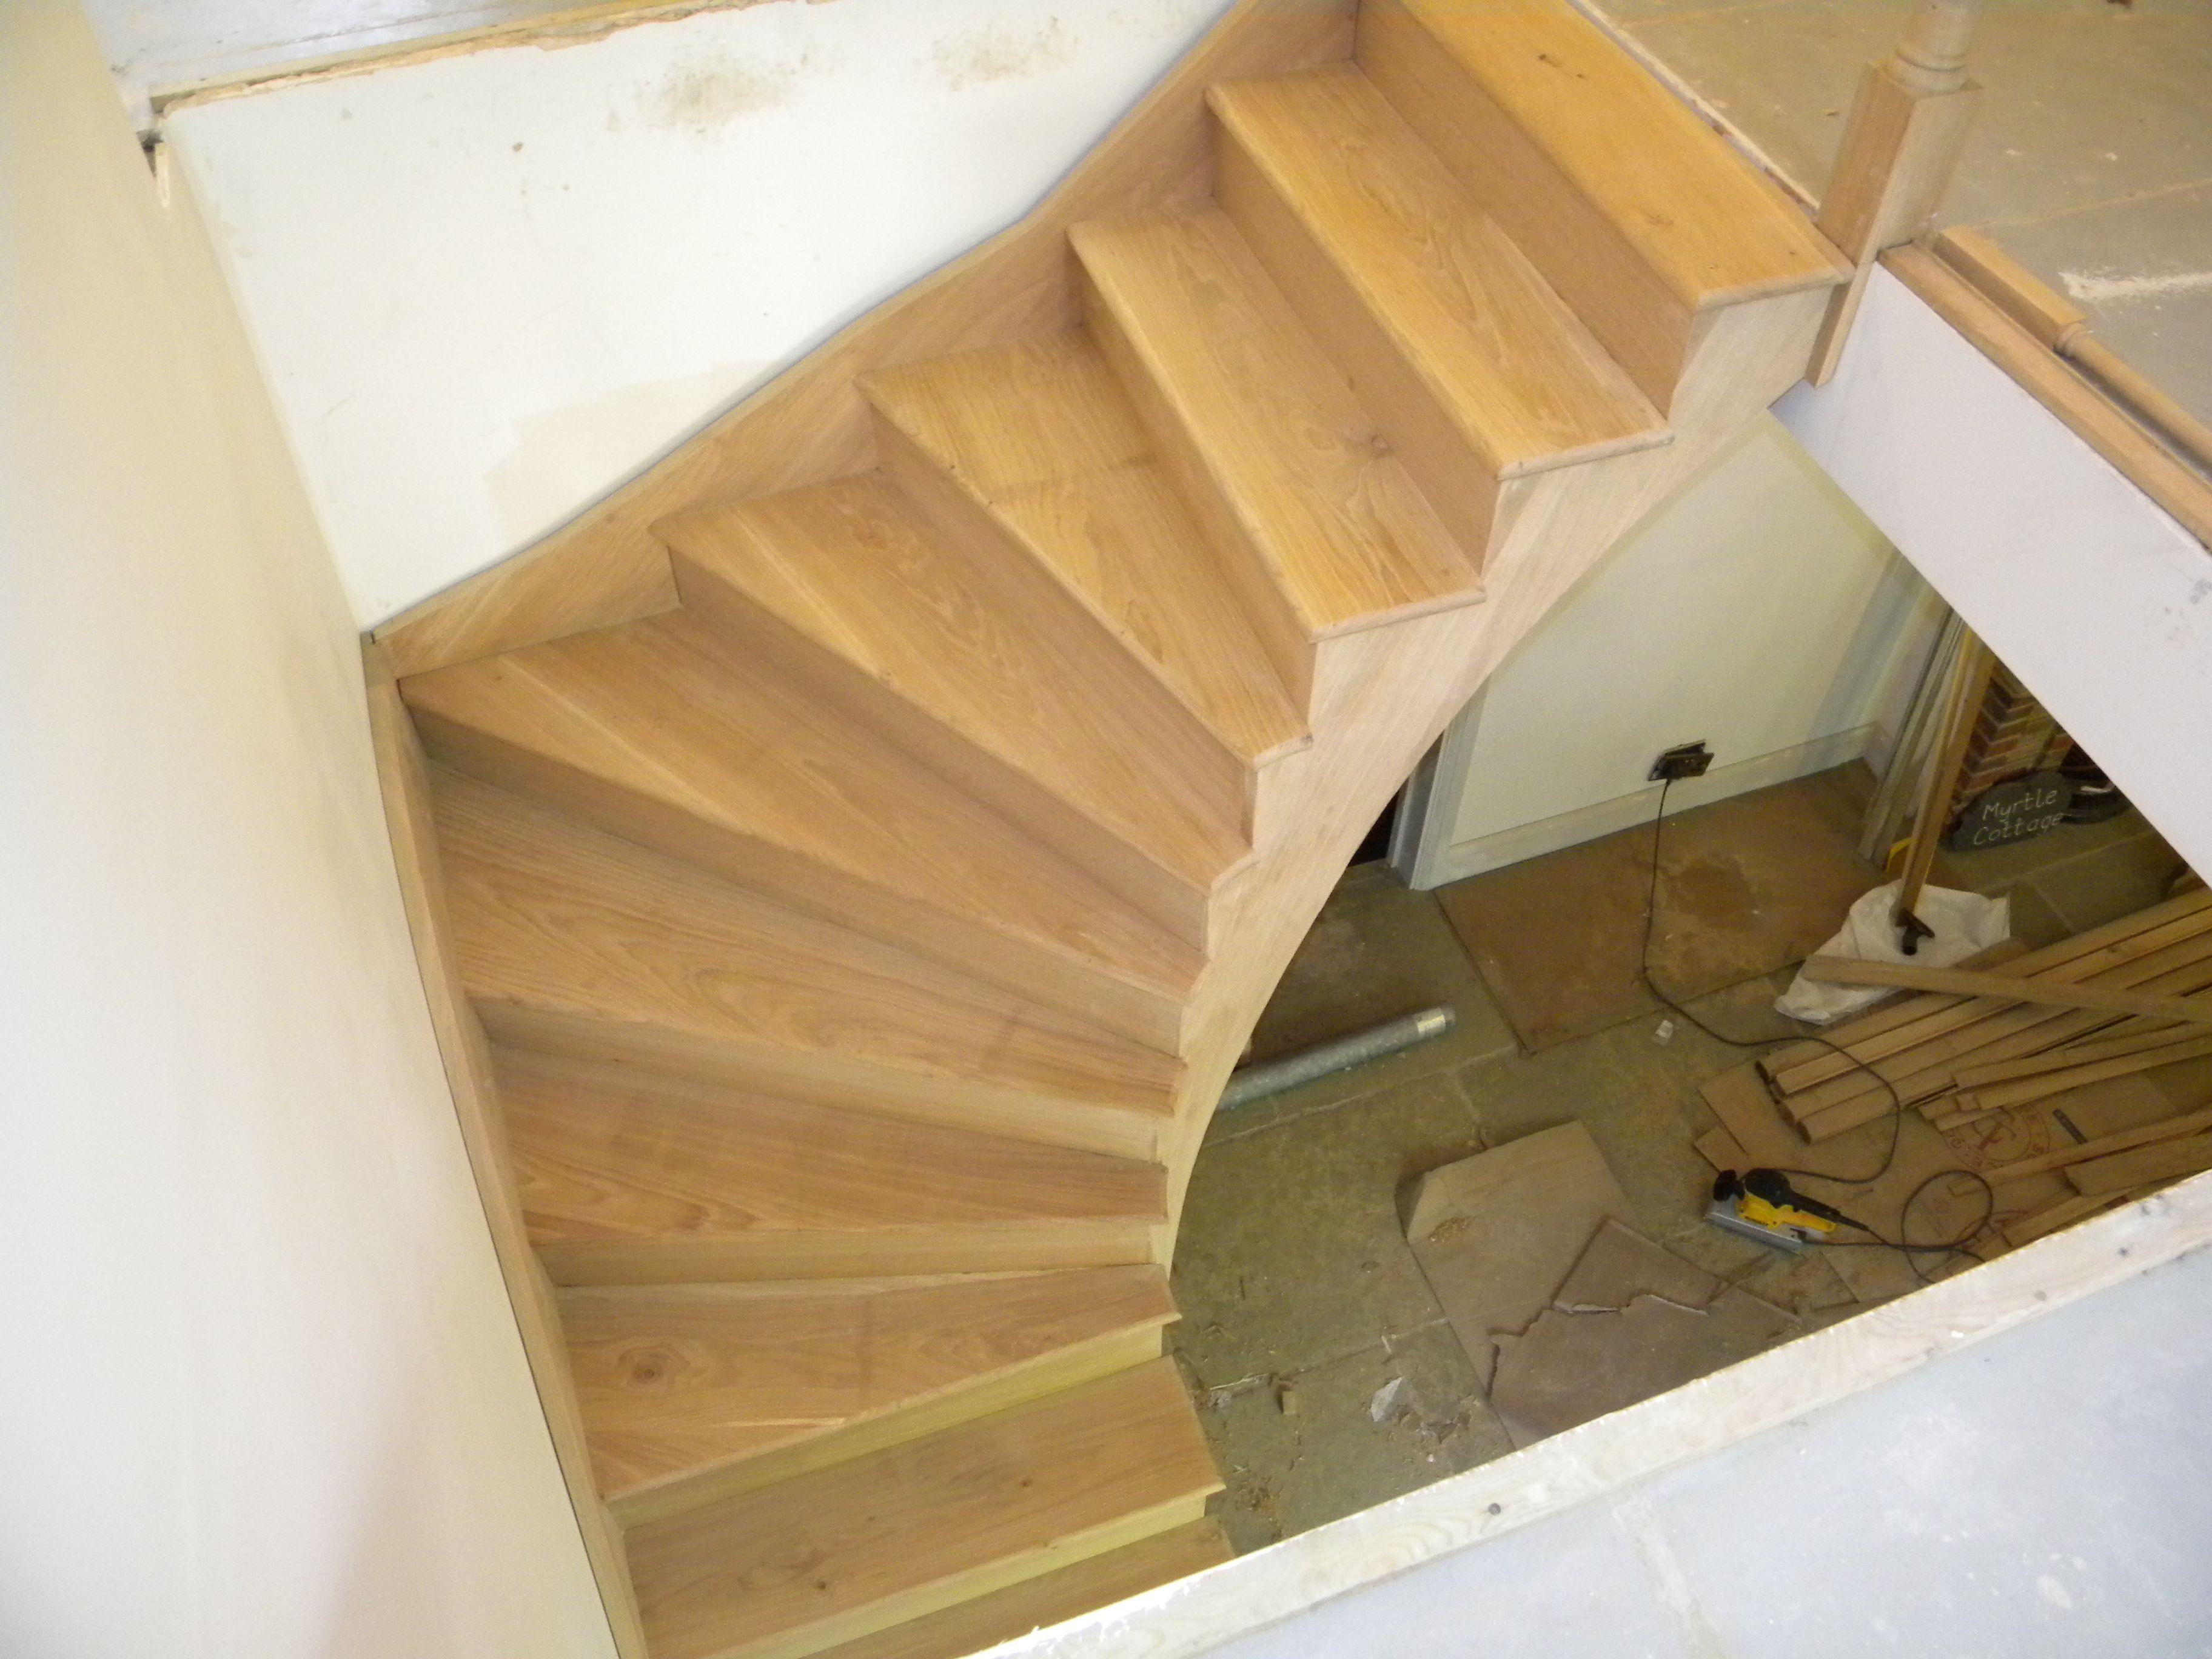 4 Blindsiding Diy Ideas Attic Stairs Quilt Pattern Attic Window Ideas Attic Study Work Stations Attic Low Ceiling Beds Attic Room Tumblr Escadas